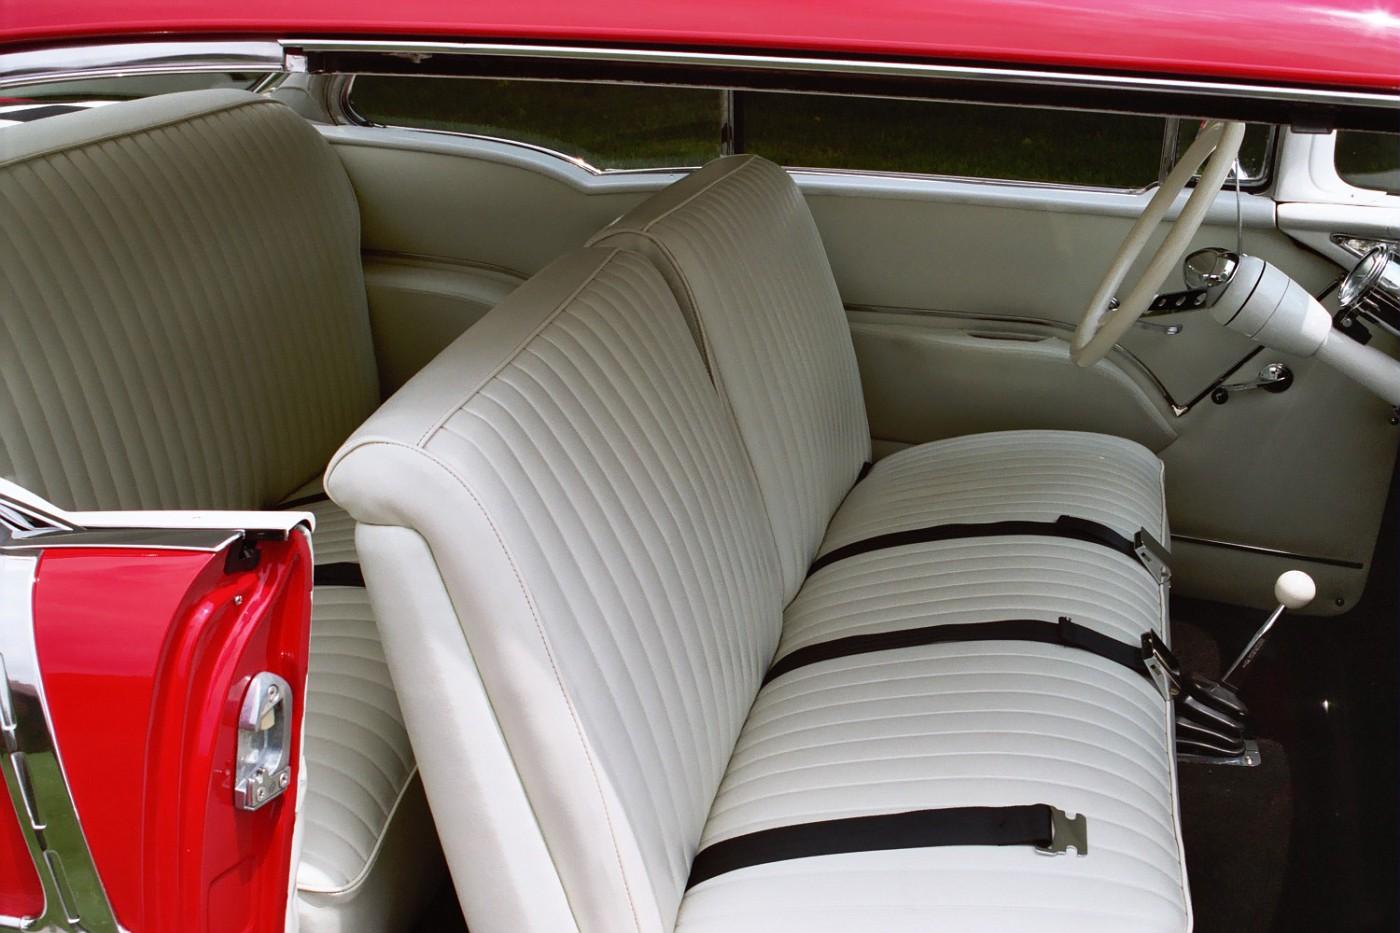 55 Chevy Vintage Style Interior